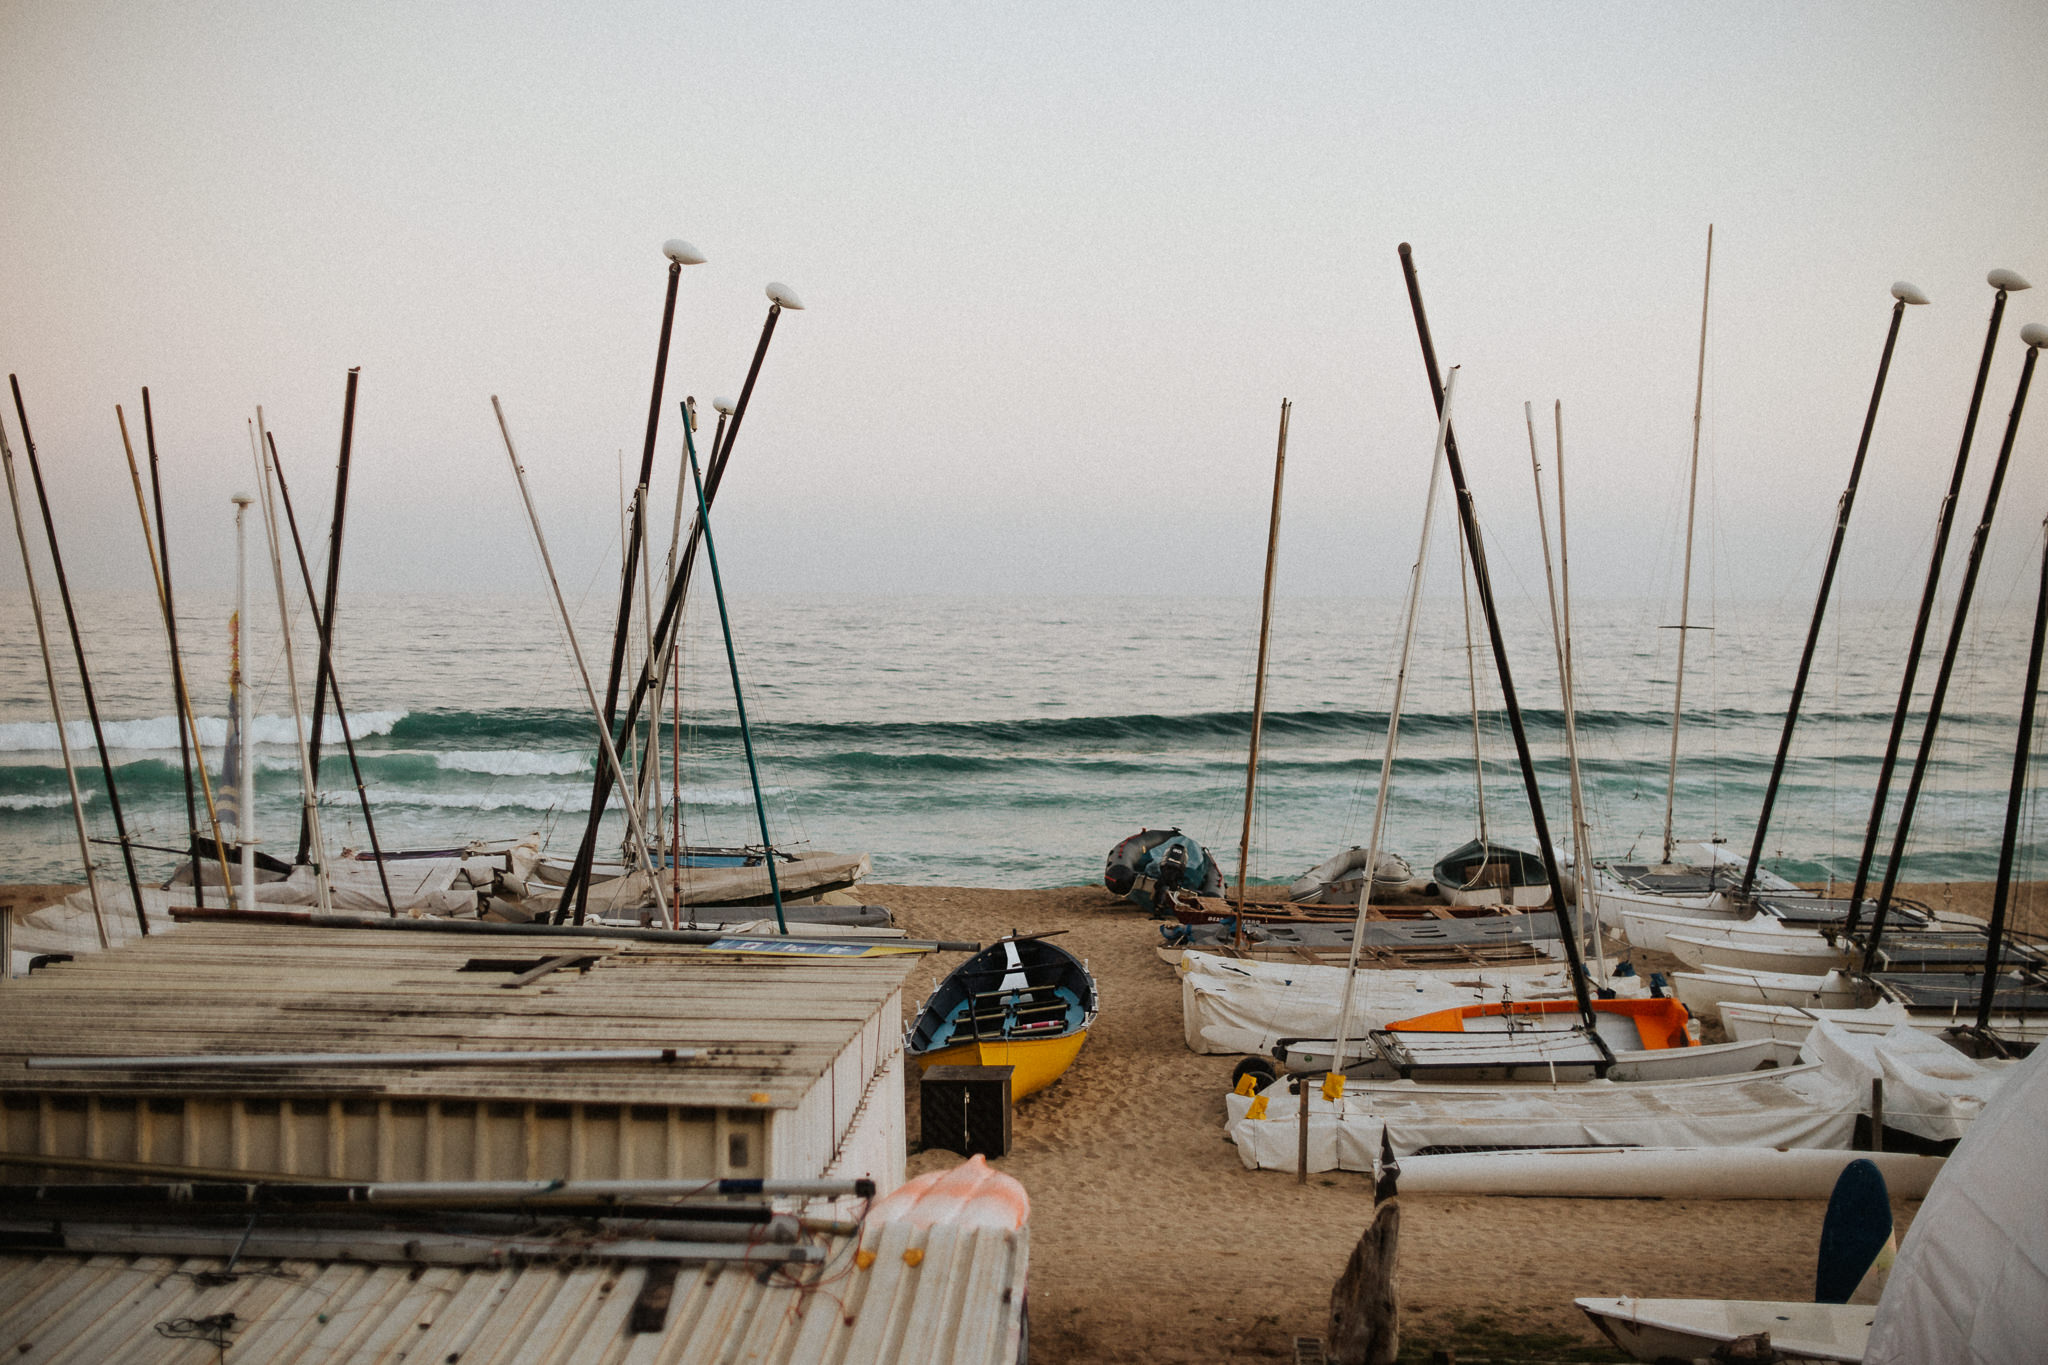 Sailboats mediterranean sea beach canoe